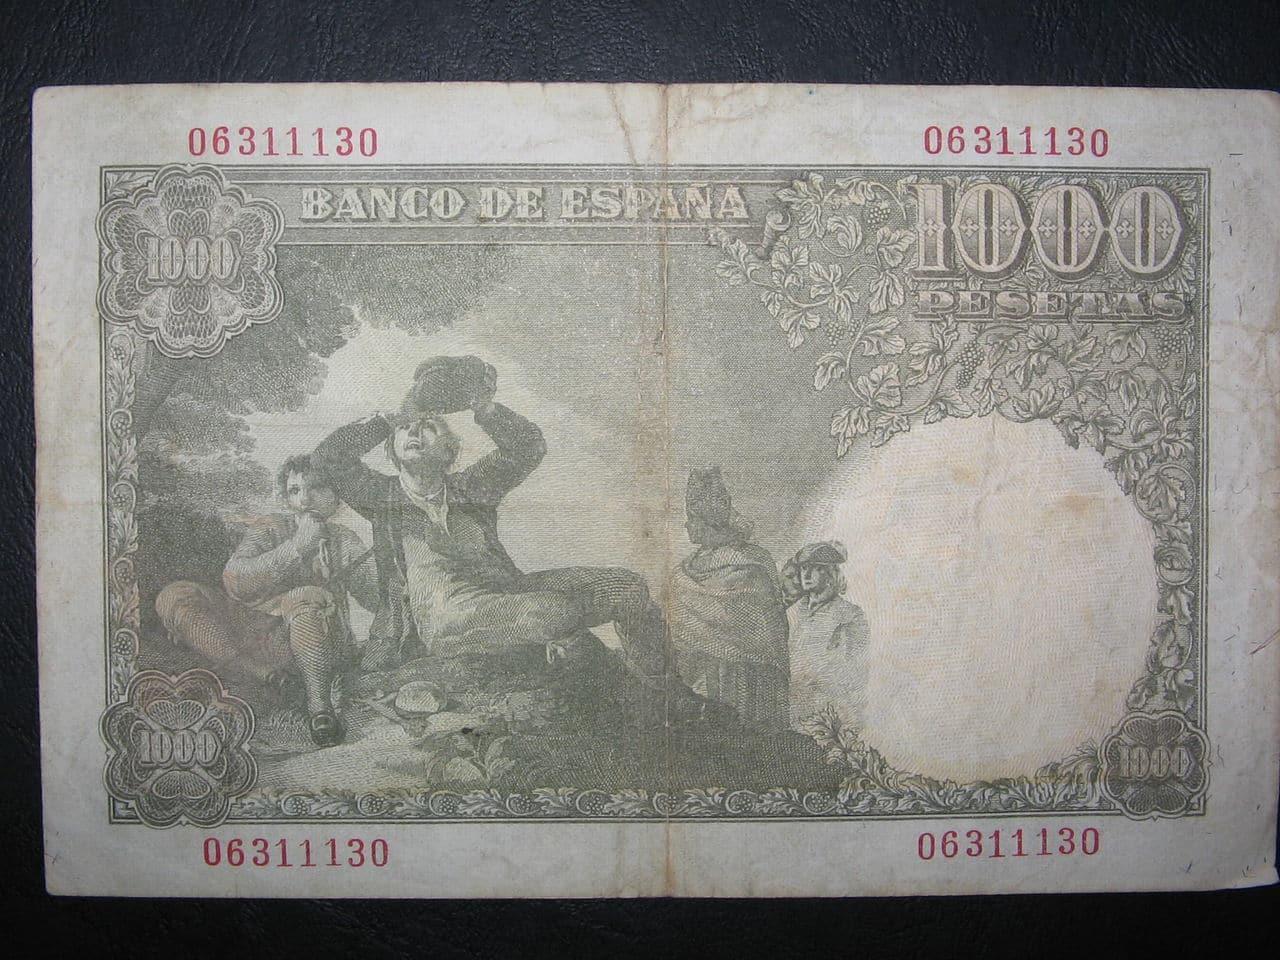 1000 Pesetas, 1949 004